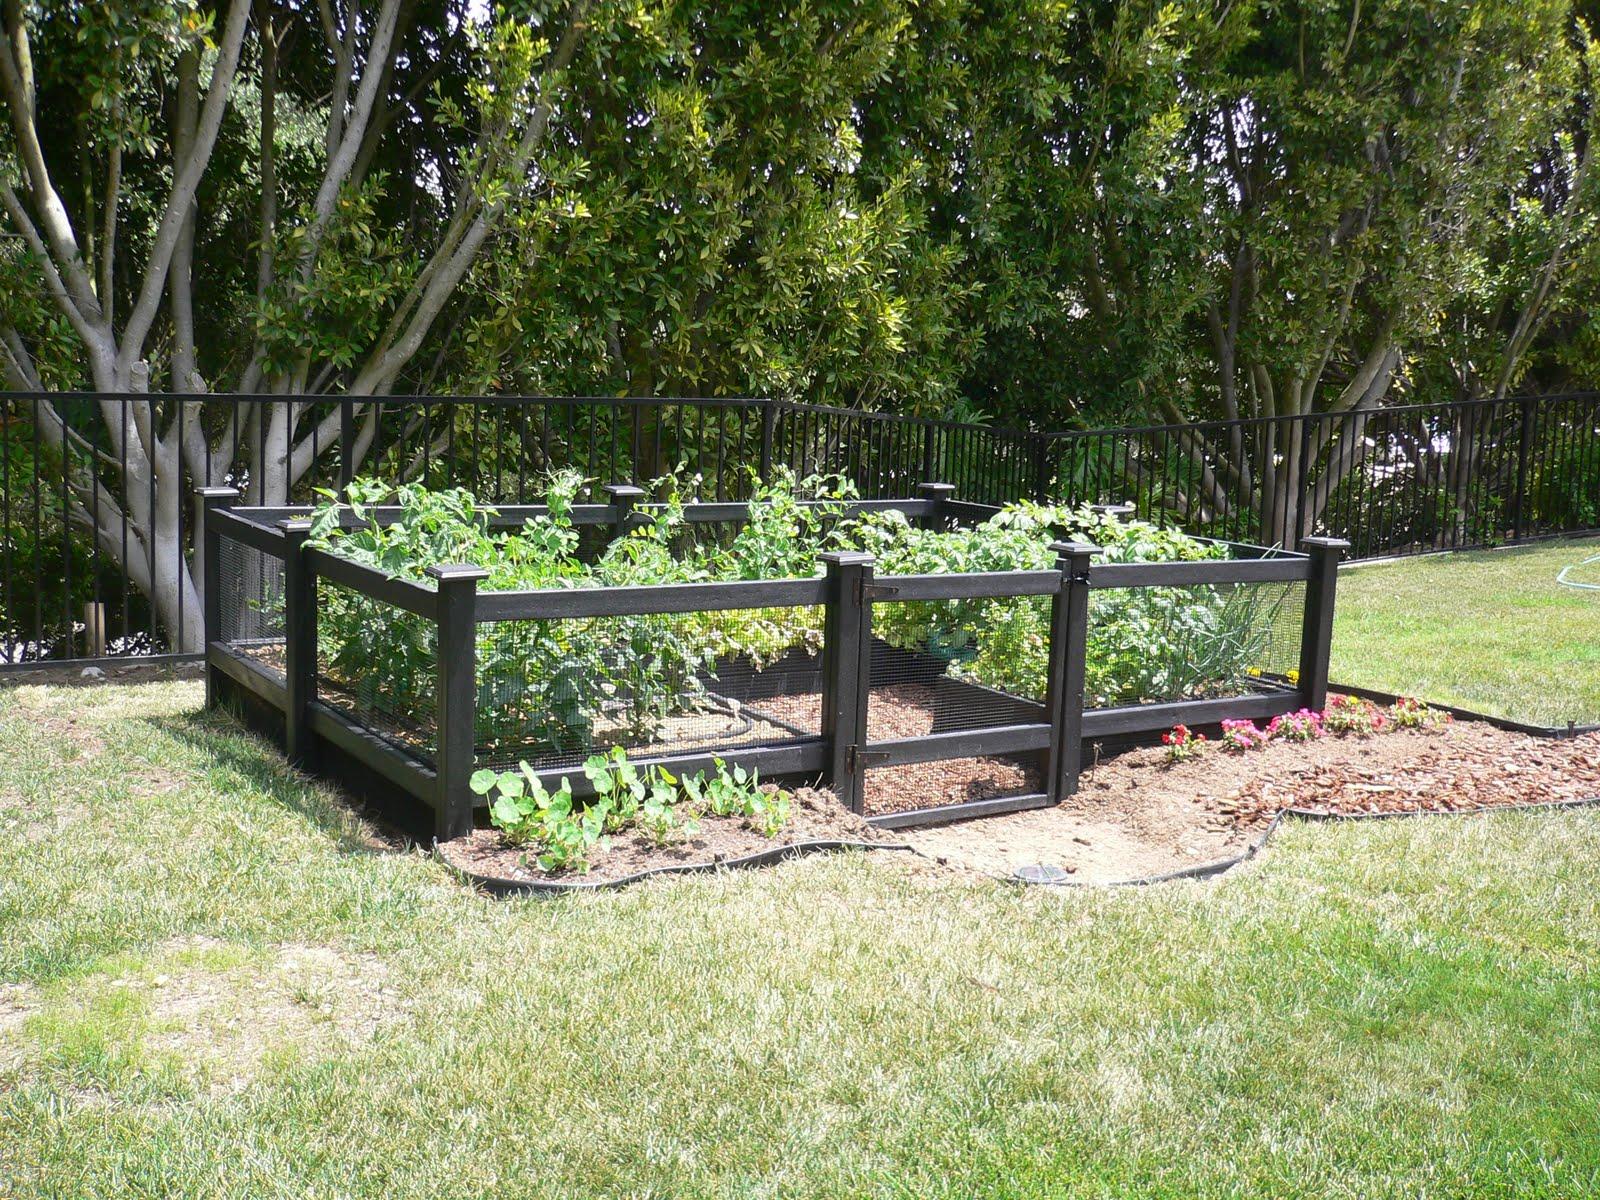 Ordinaire Vegetable Garden Fence Ideas Photo   2